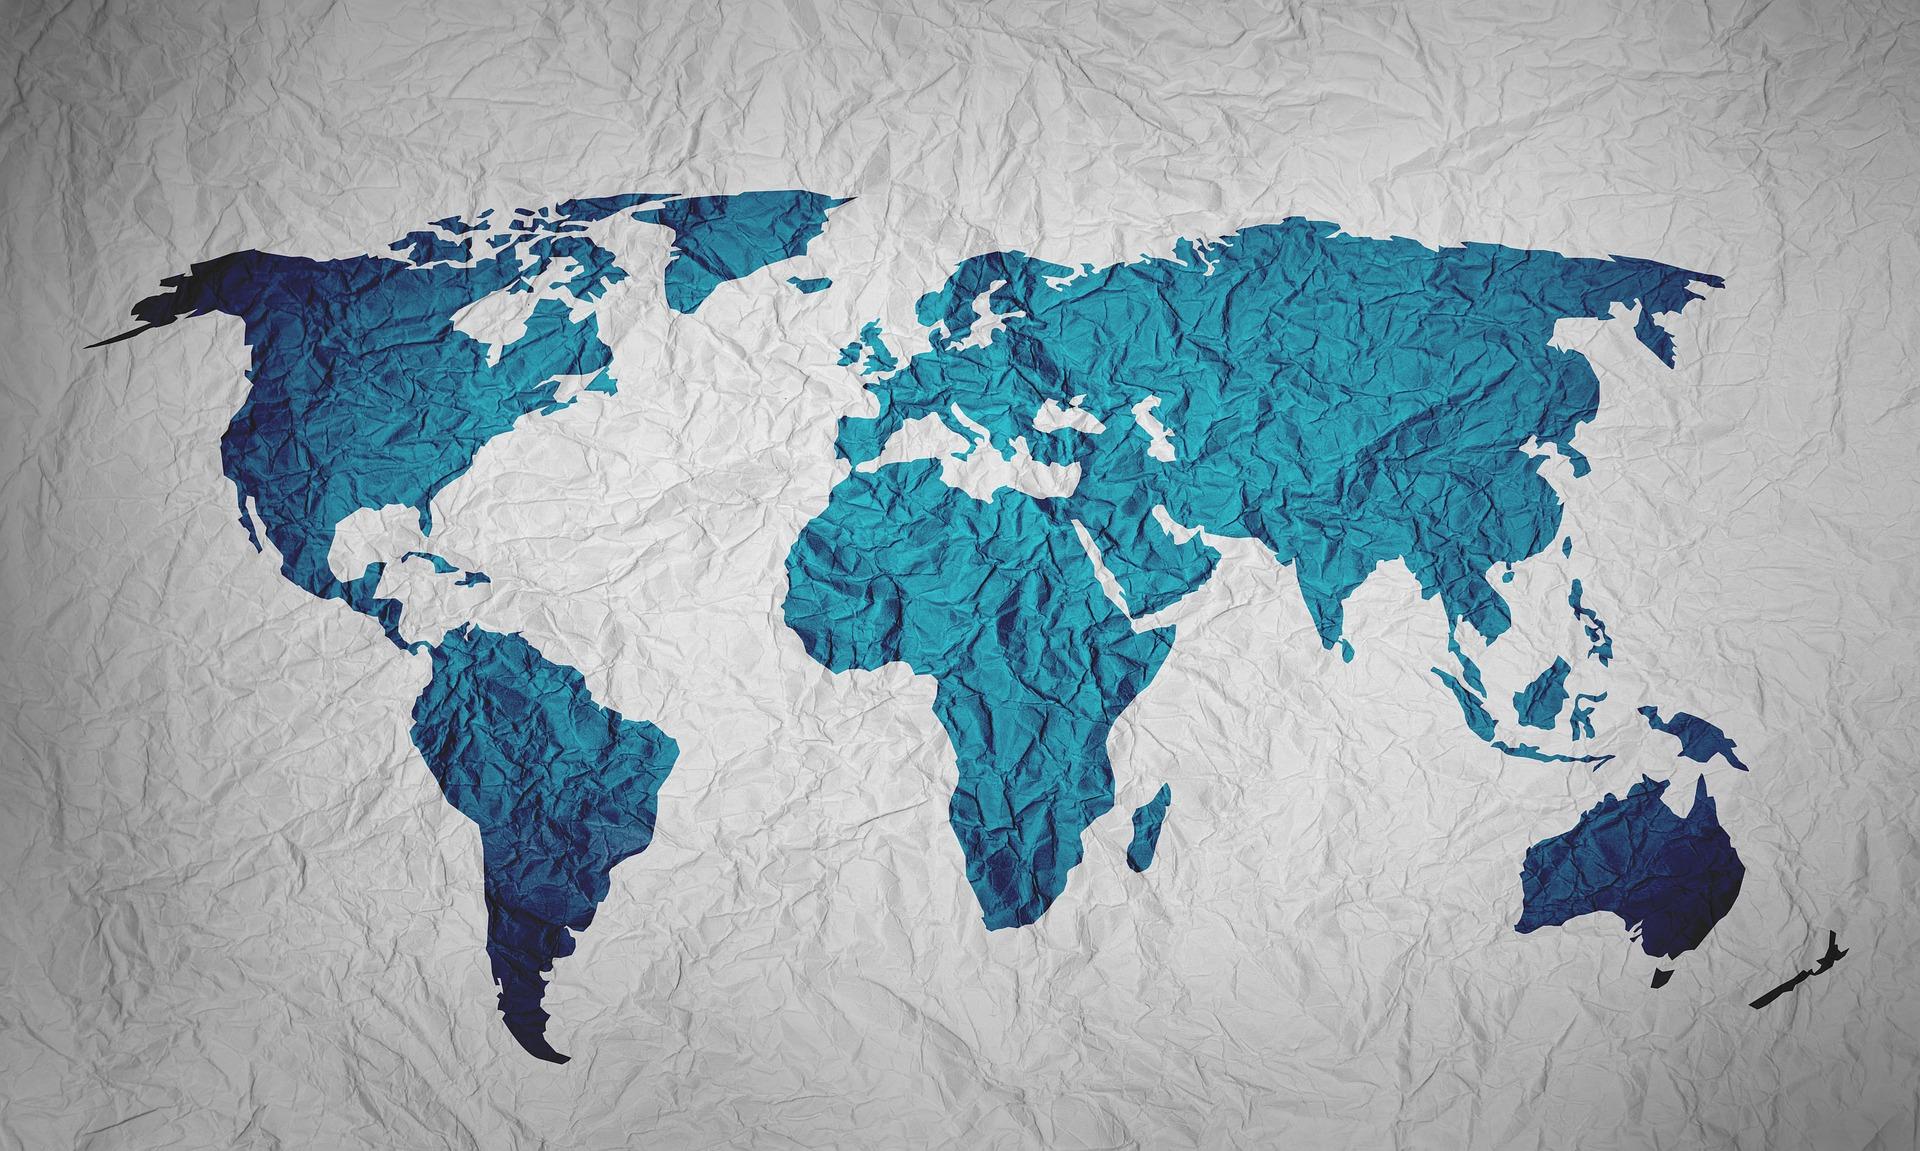 map-of-the-world-2401458_1920.jpg